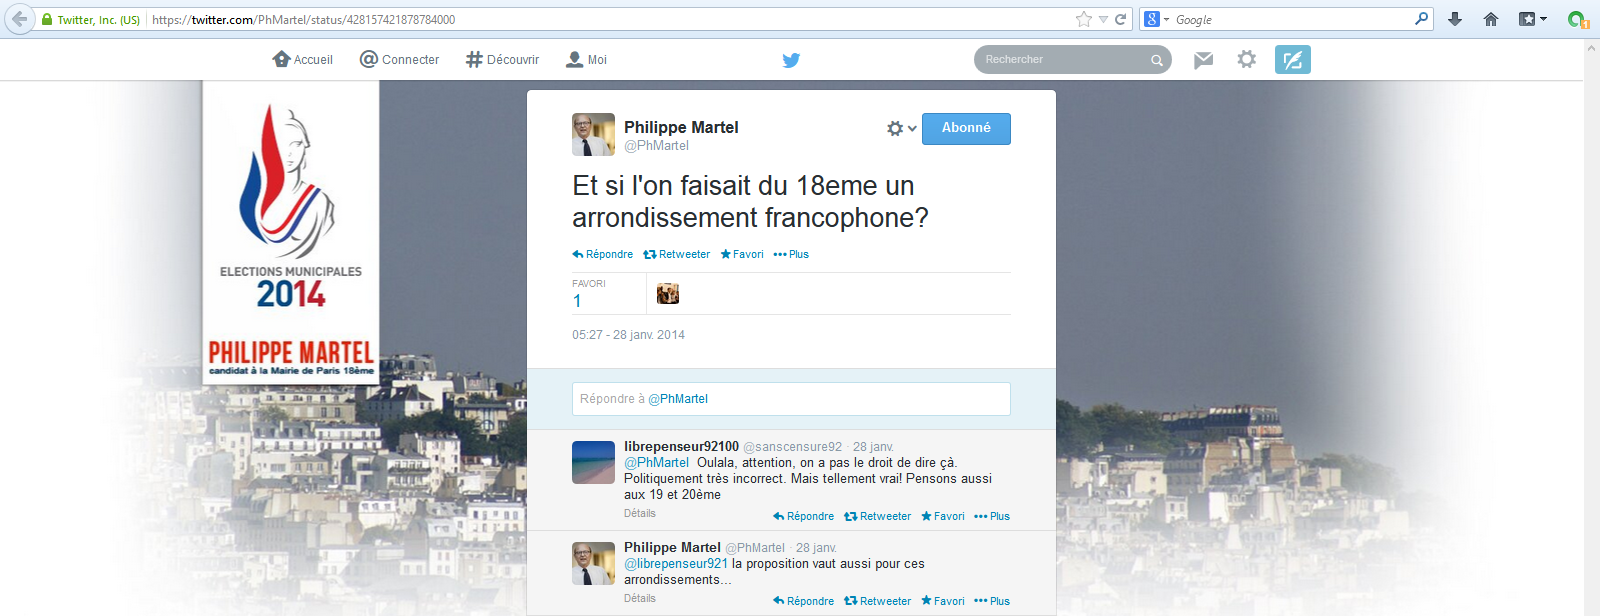 Philippe-Martel-18e-arrondissement-francophone